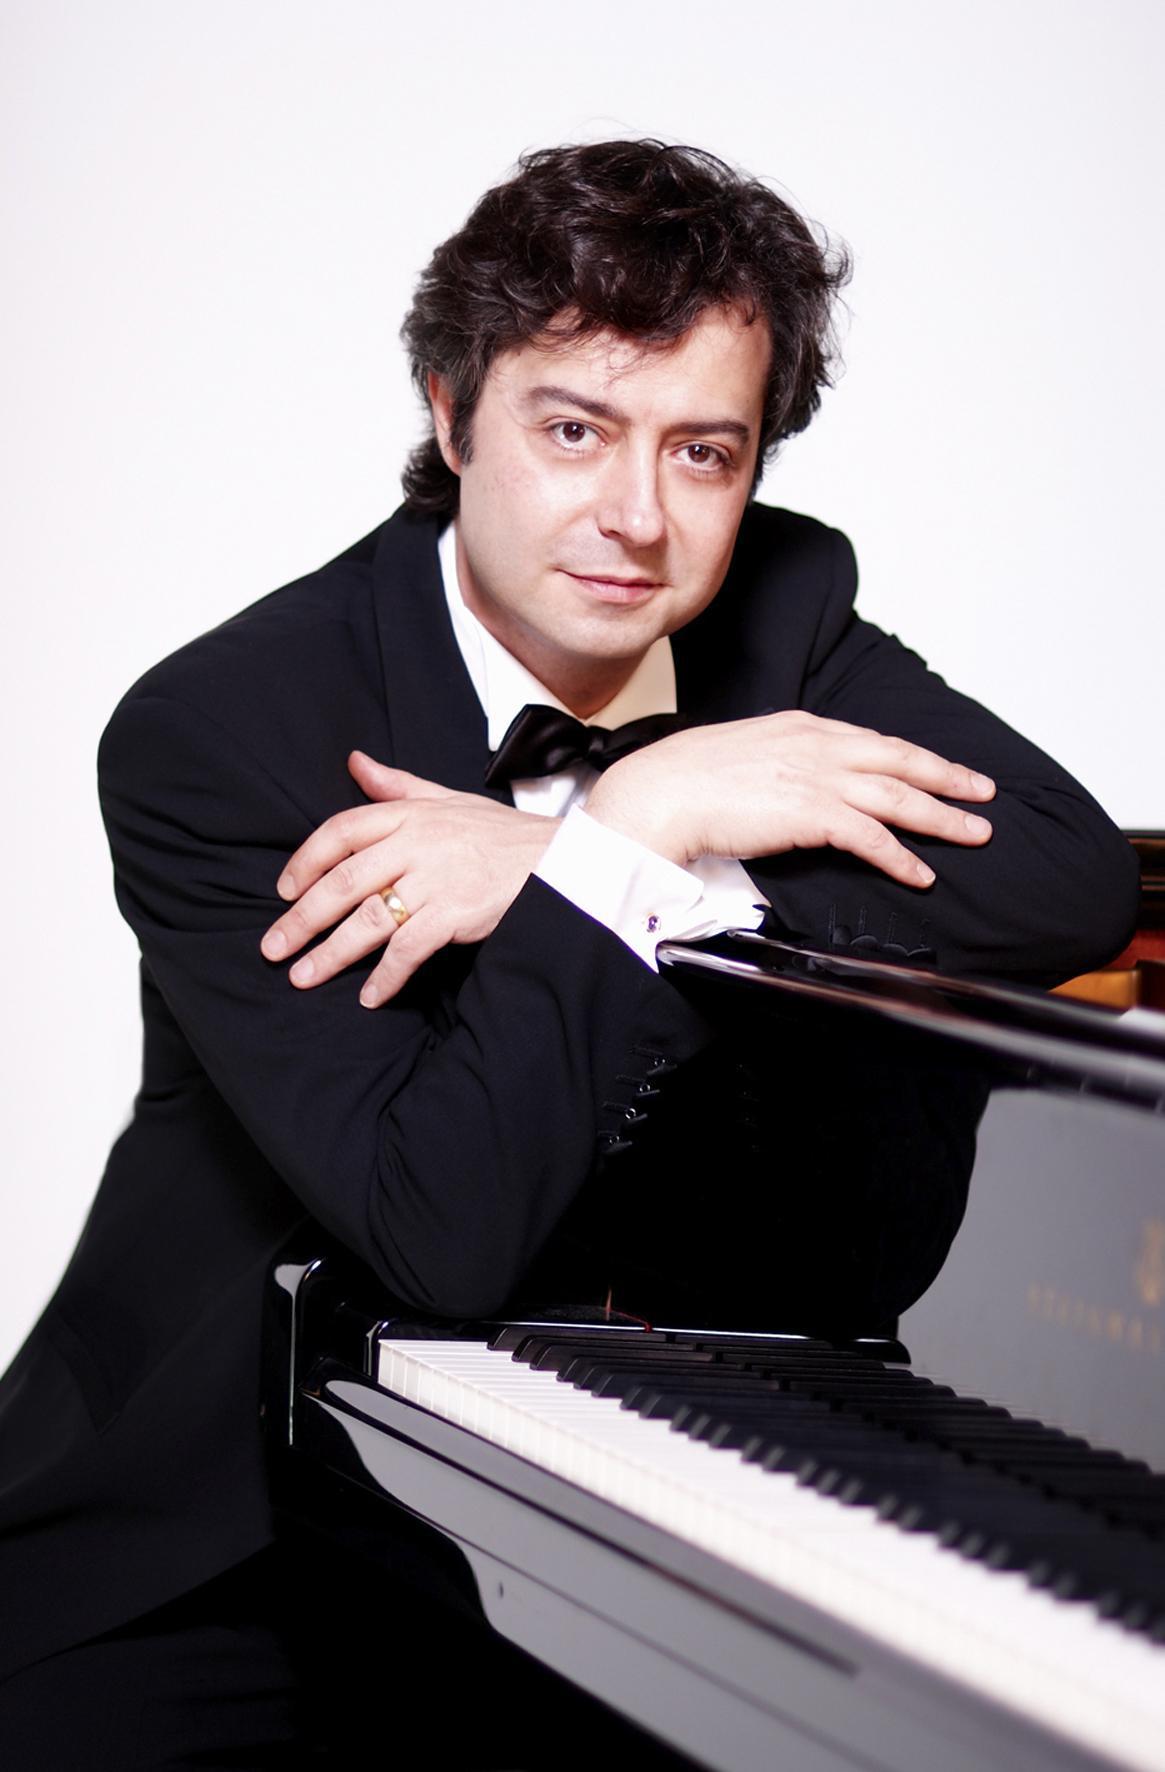 Fabio Bidini is returning to play Tchaikovsky with JoAnn Falletta and the Buffalo Philharmonic Orchestra.